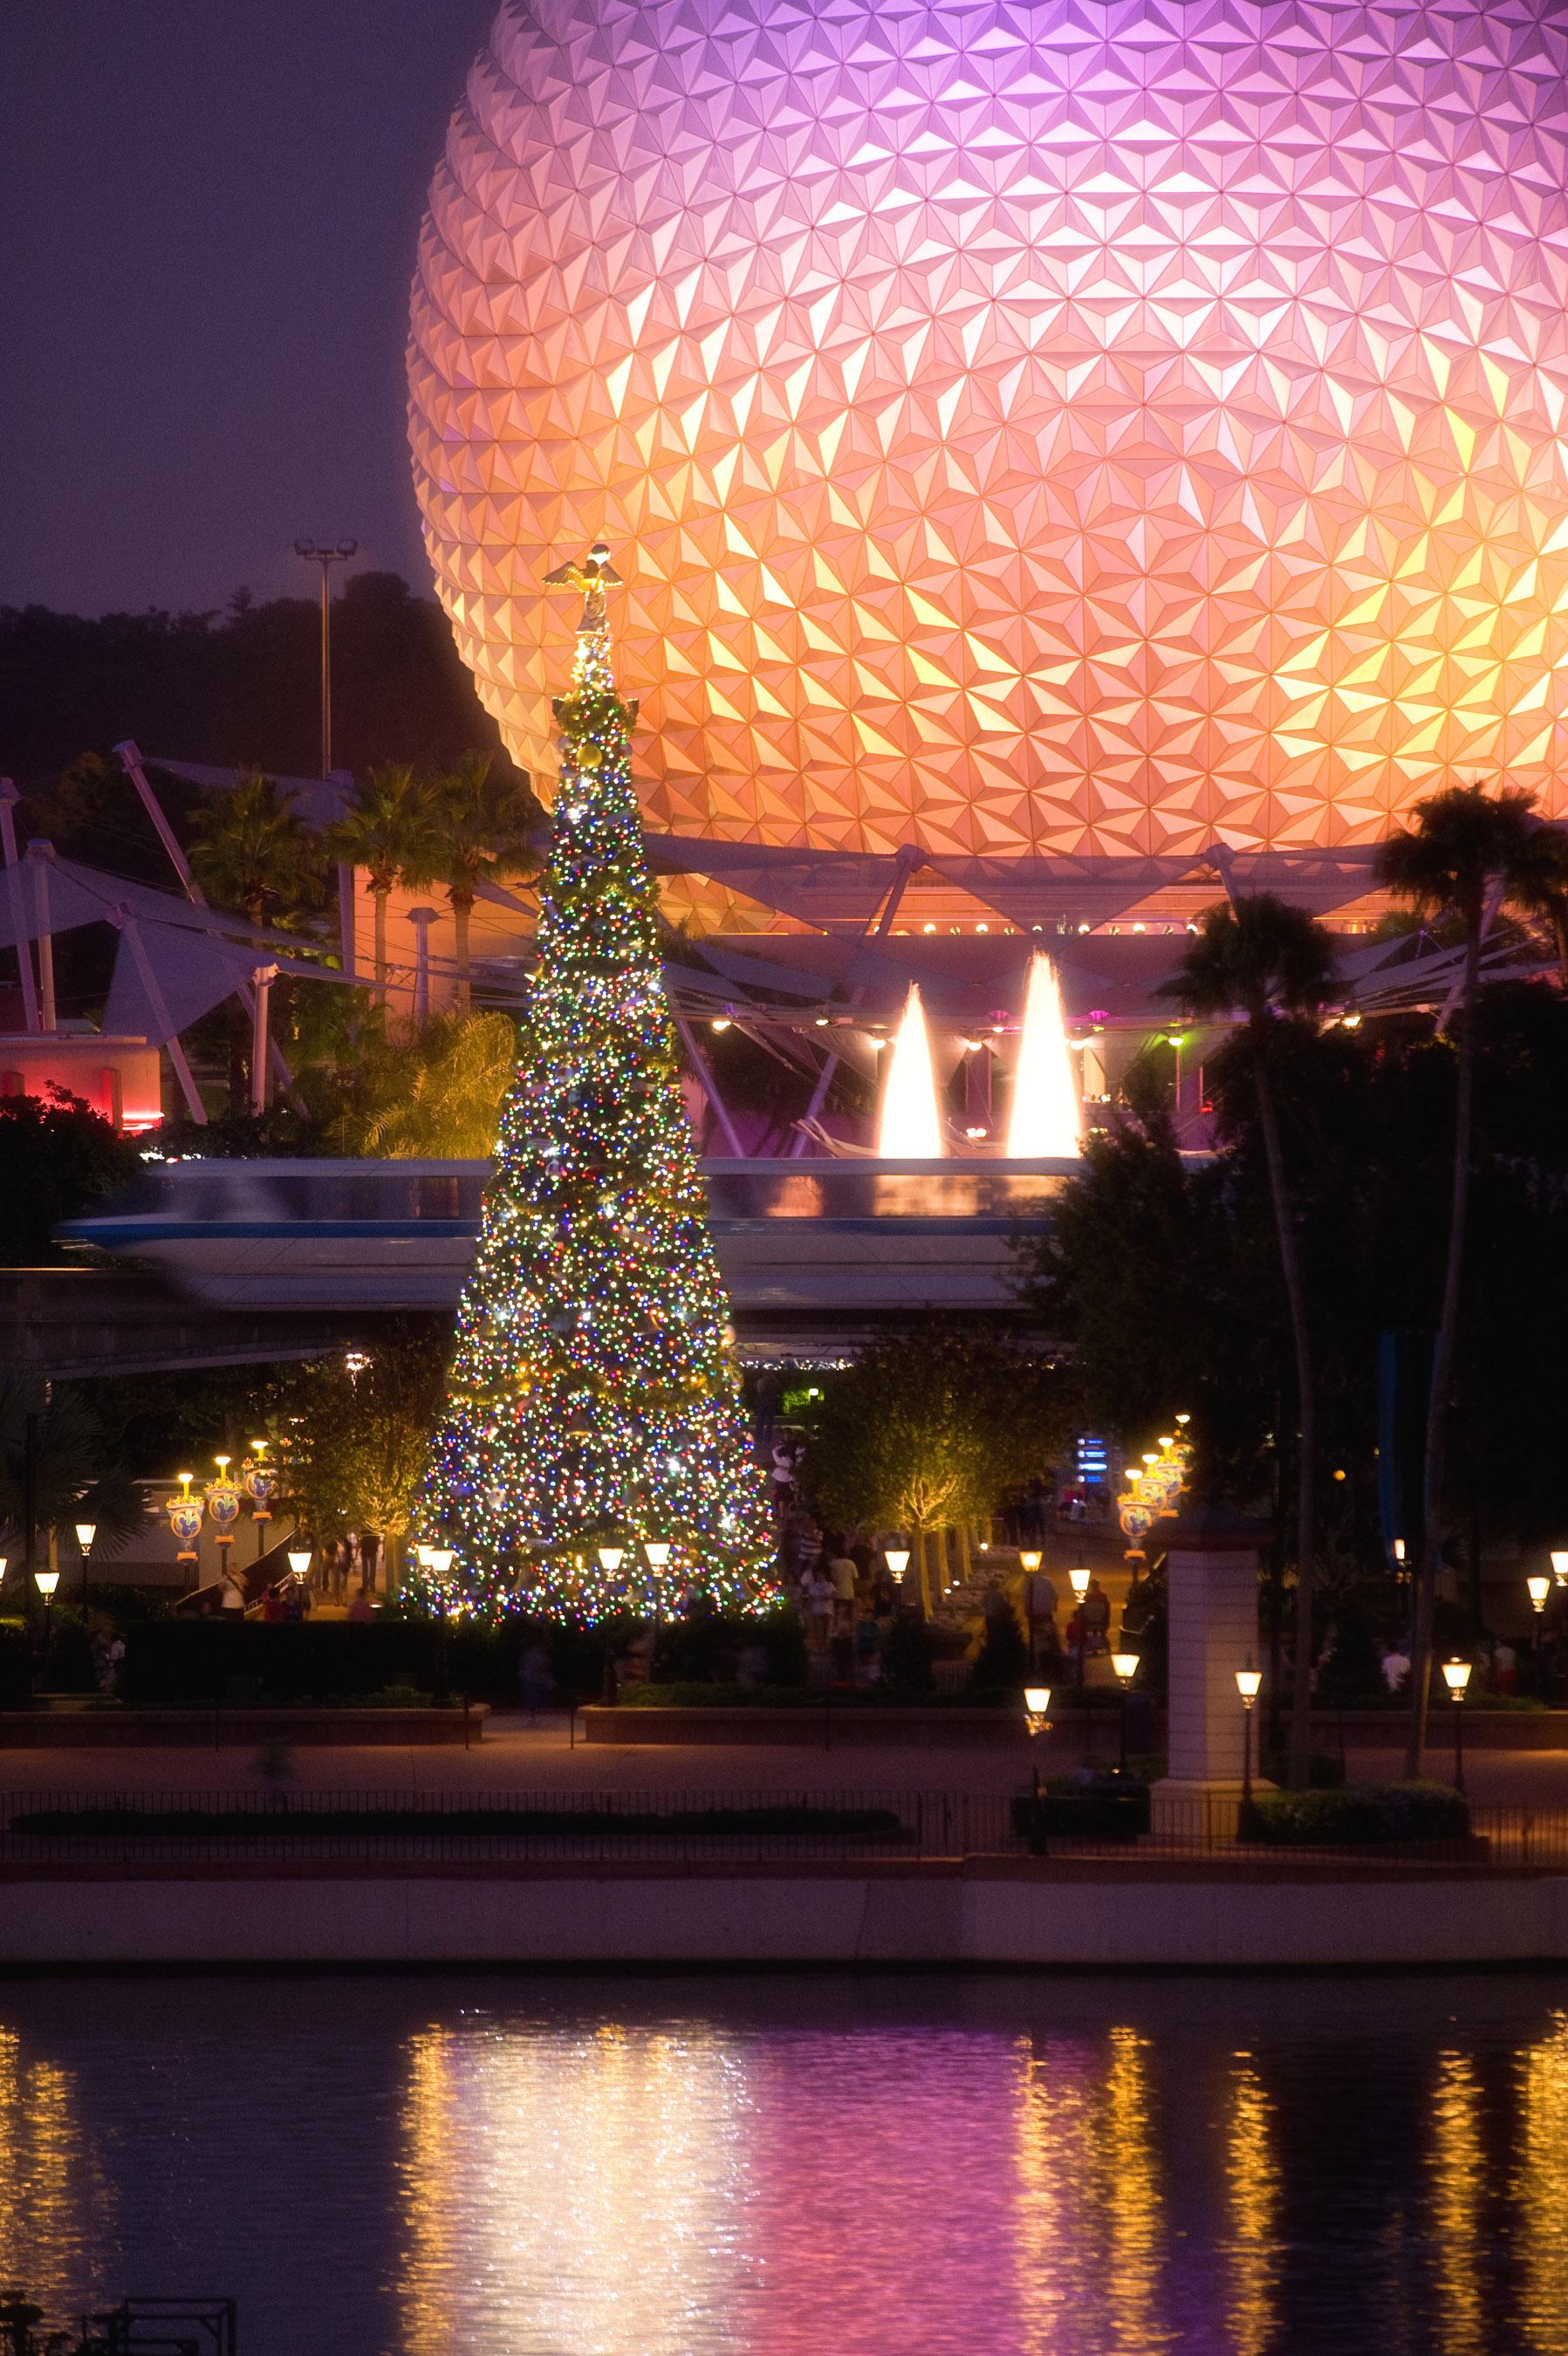 Epcot Celebrates 'Holidays Around the World'